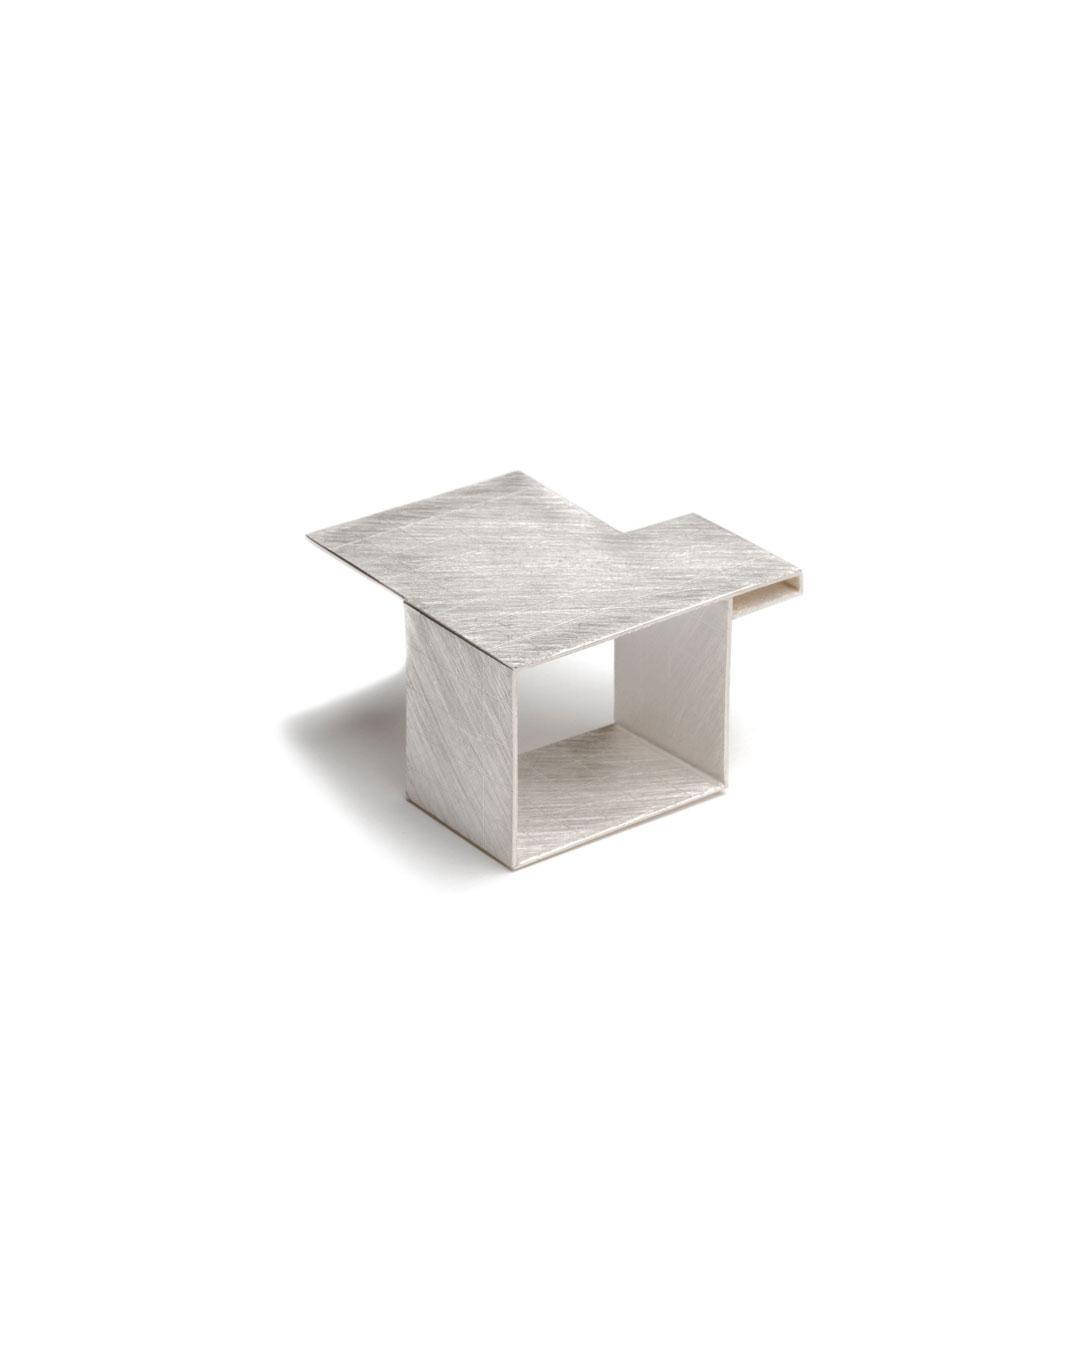 Noam Elyashiv, Grid Ring, 2017, ring; silver, 25 x 25 x 16 mm, €950